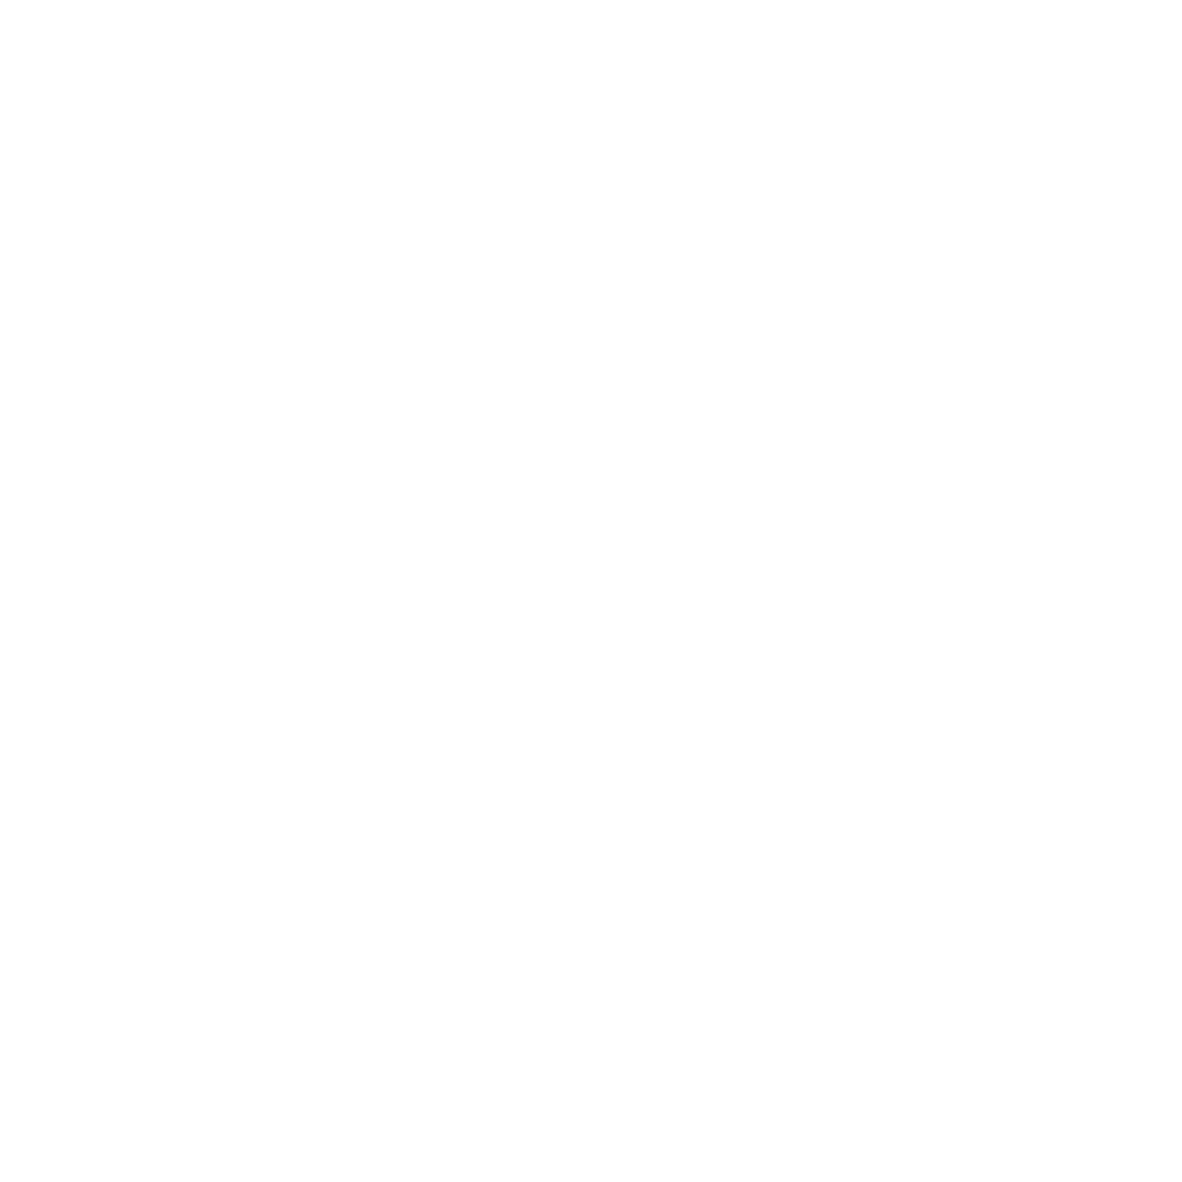 Grazyanox